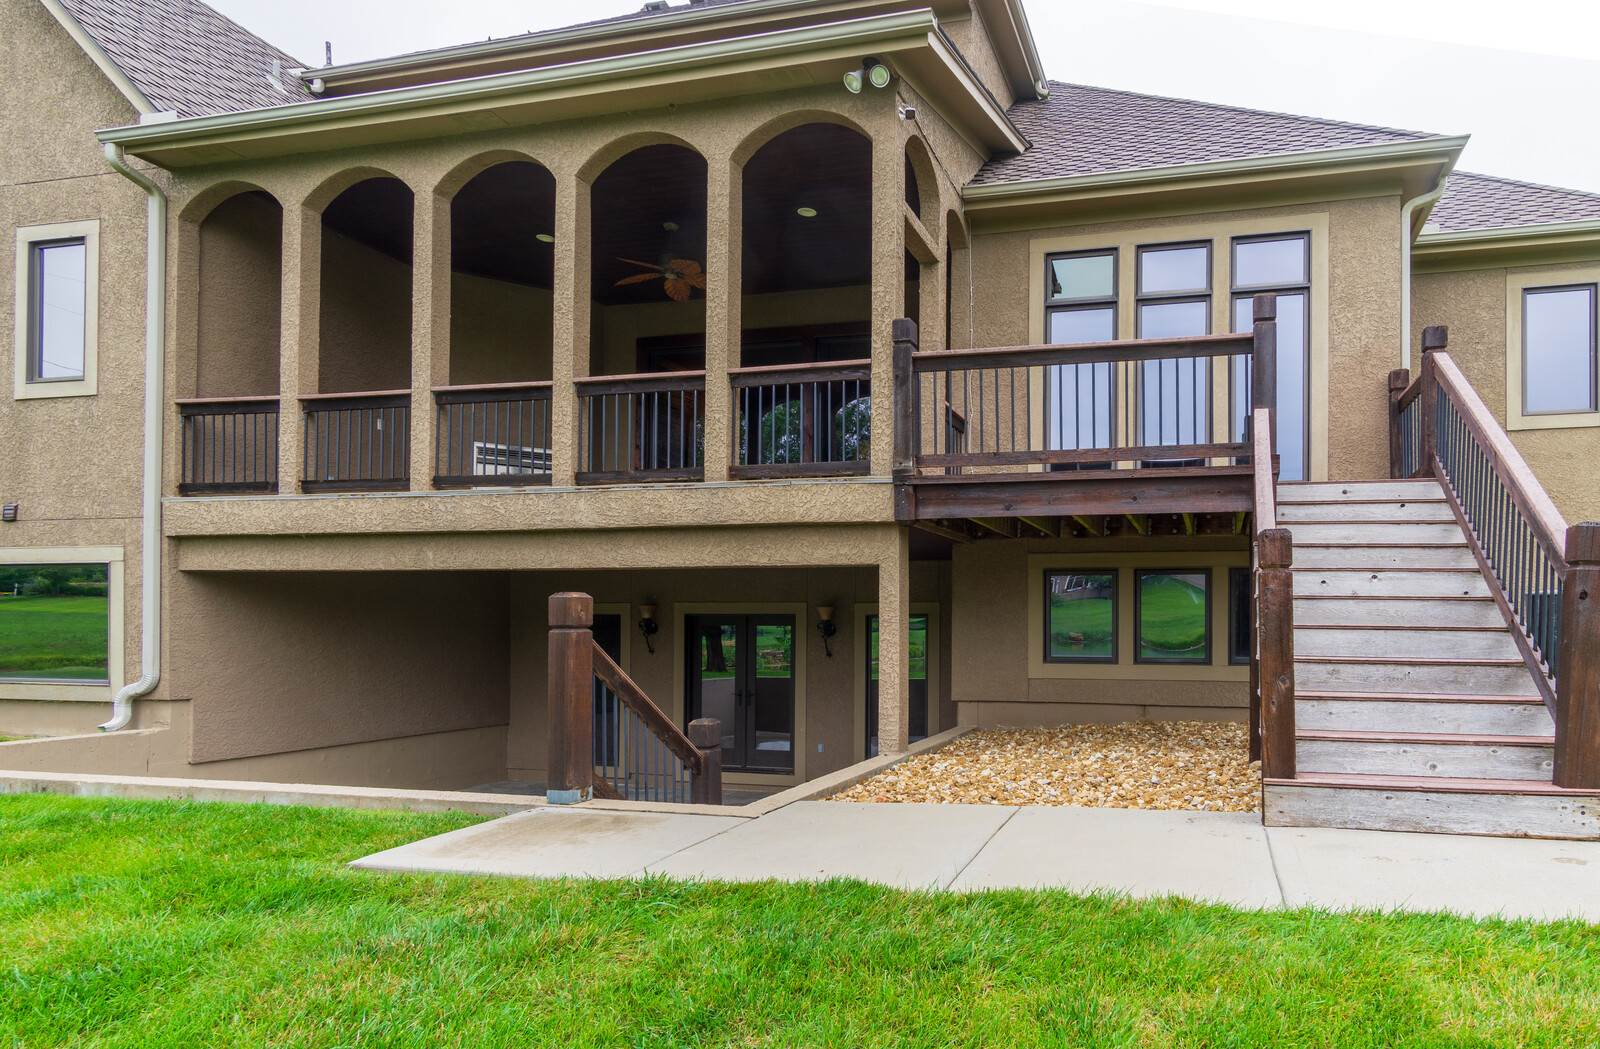 10107 W 152nd Terrace, Overland Park, KS 66221